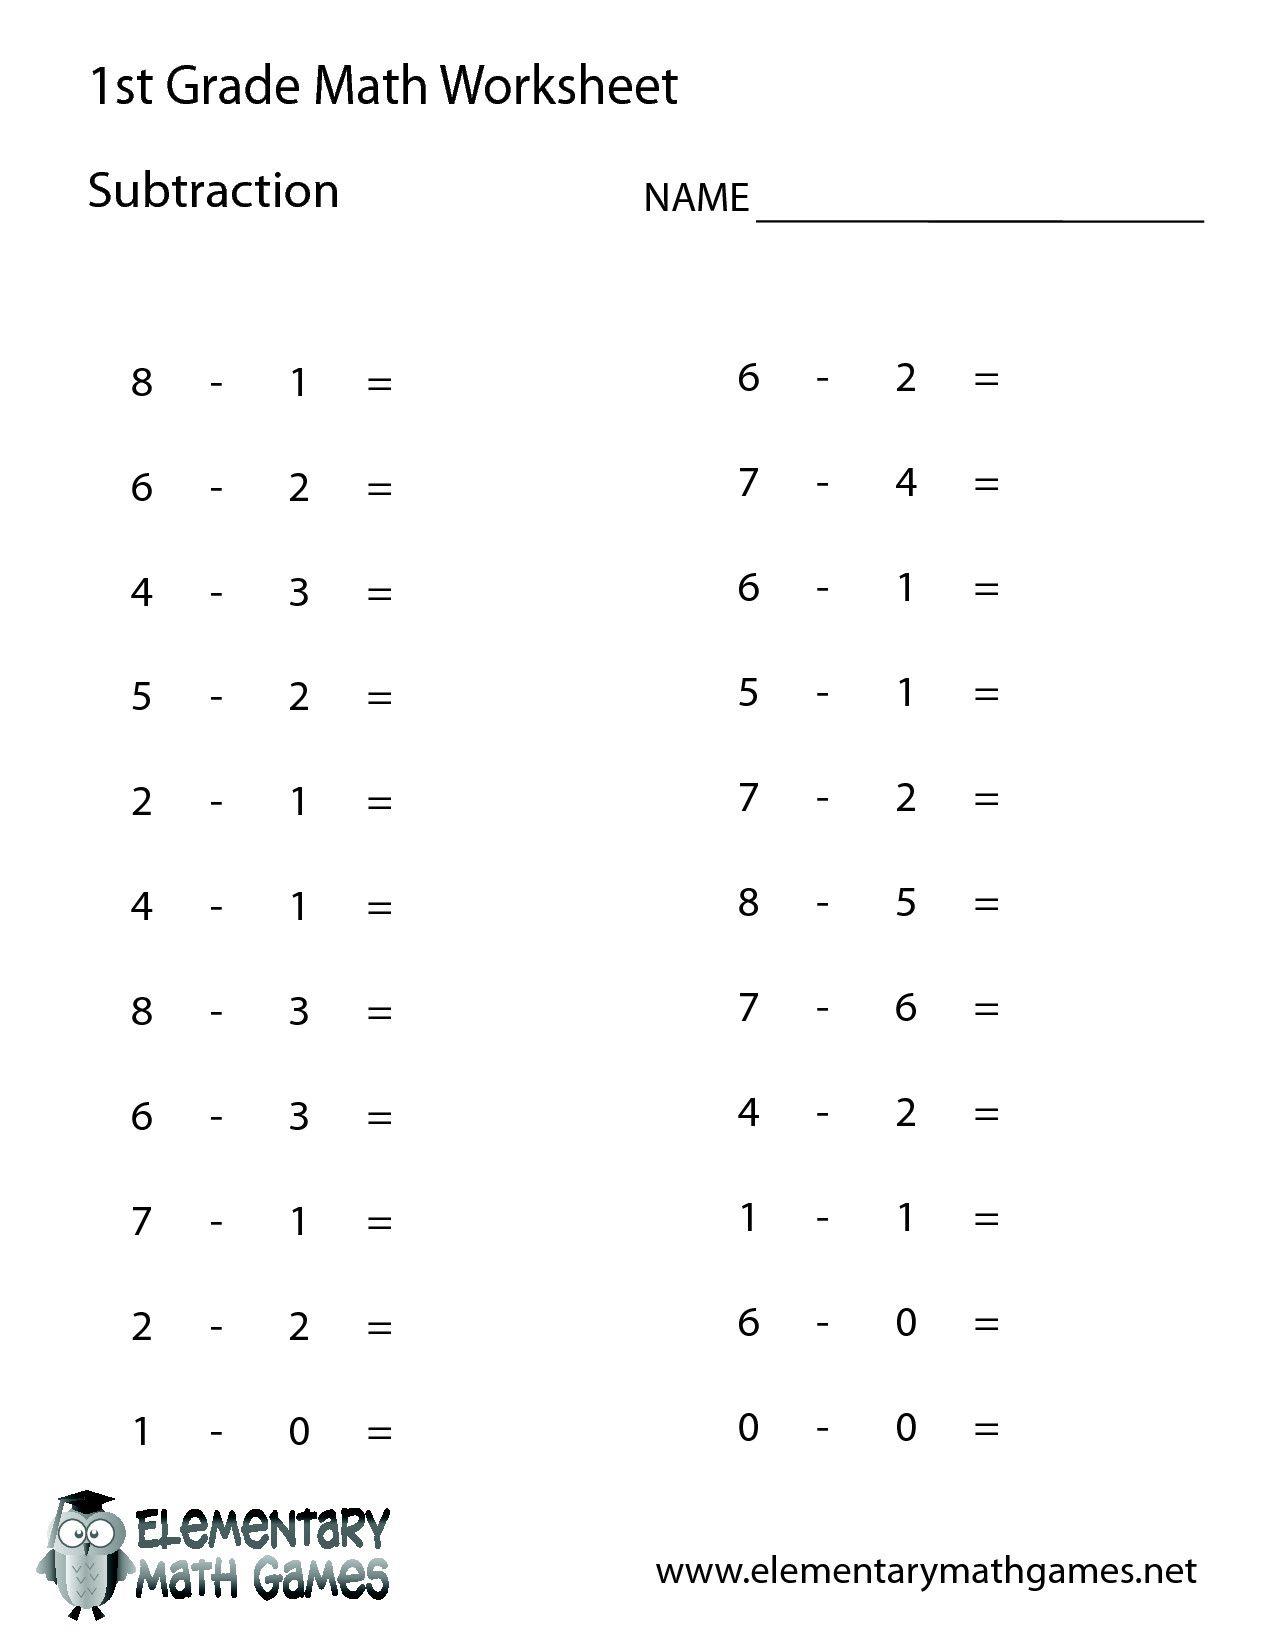 2 Addition Worksheets 1 10 Dice 1st Grade Math Worksheets First Grade Math Worksheets Free Printable Math Worksheets 1st Grade Math Worksheets [ 1650 x 1275 Pixel ]